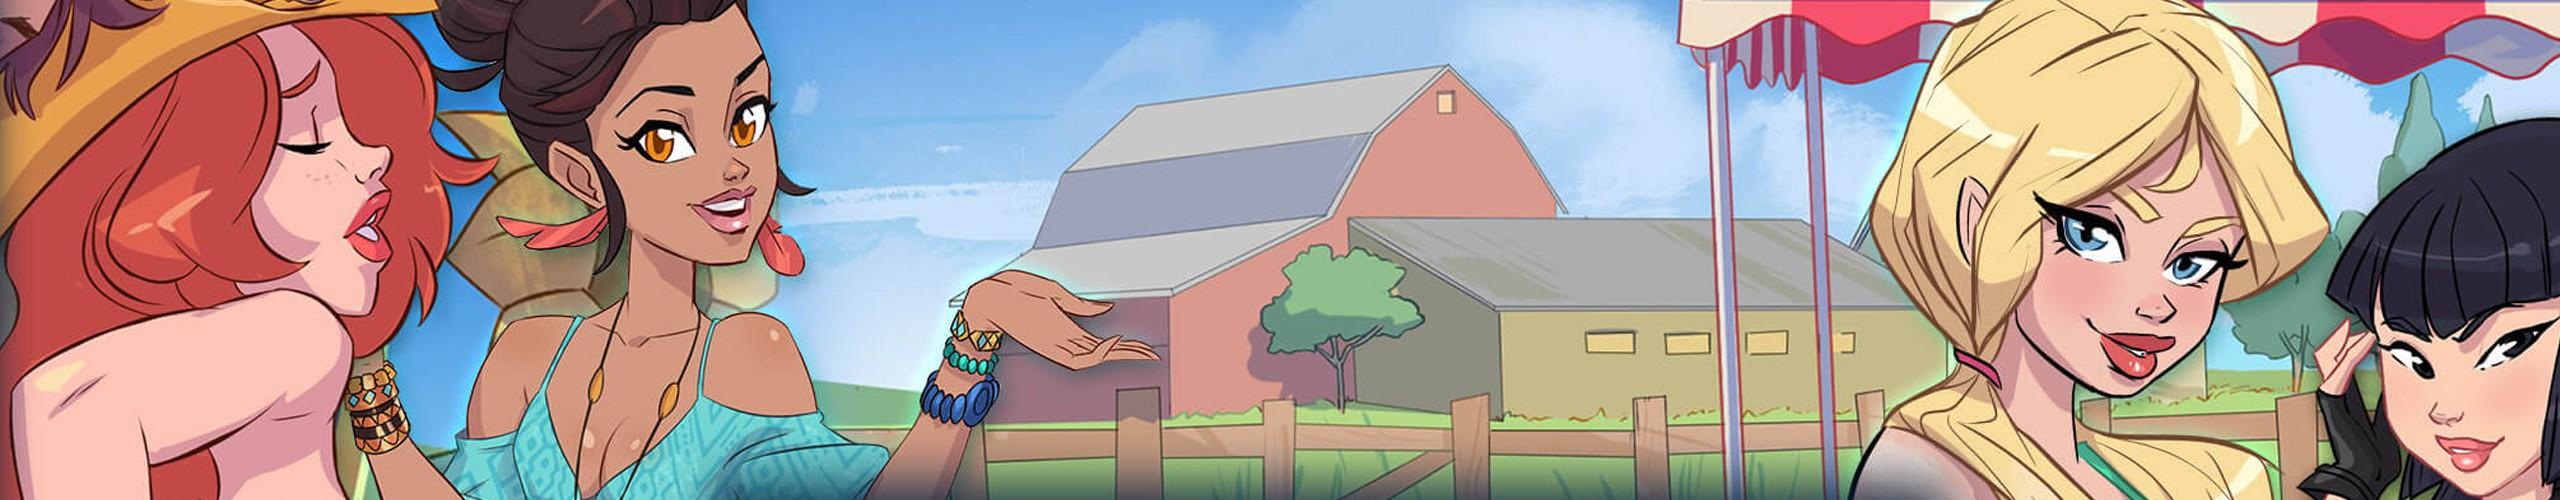 Booty Farm